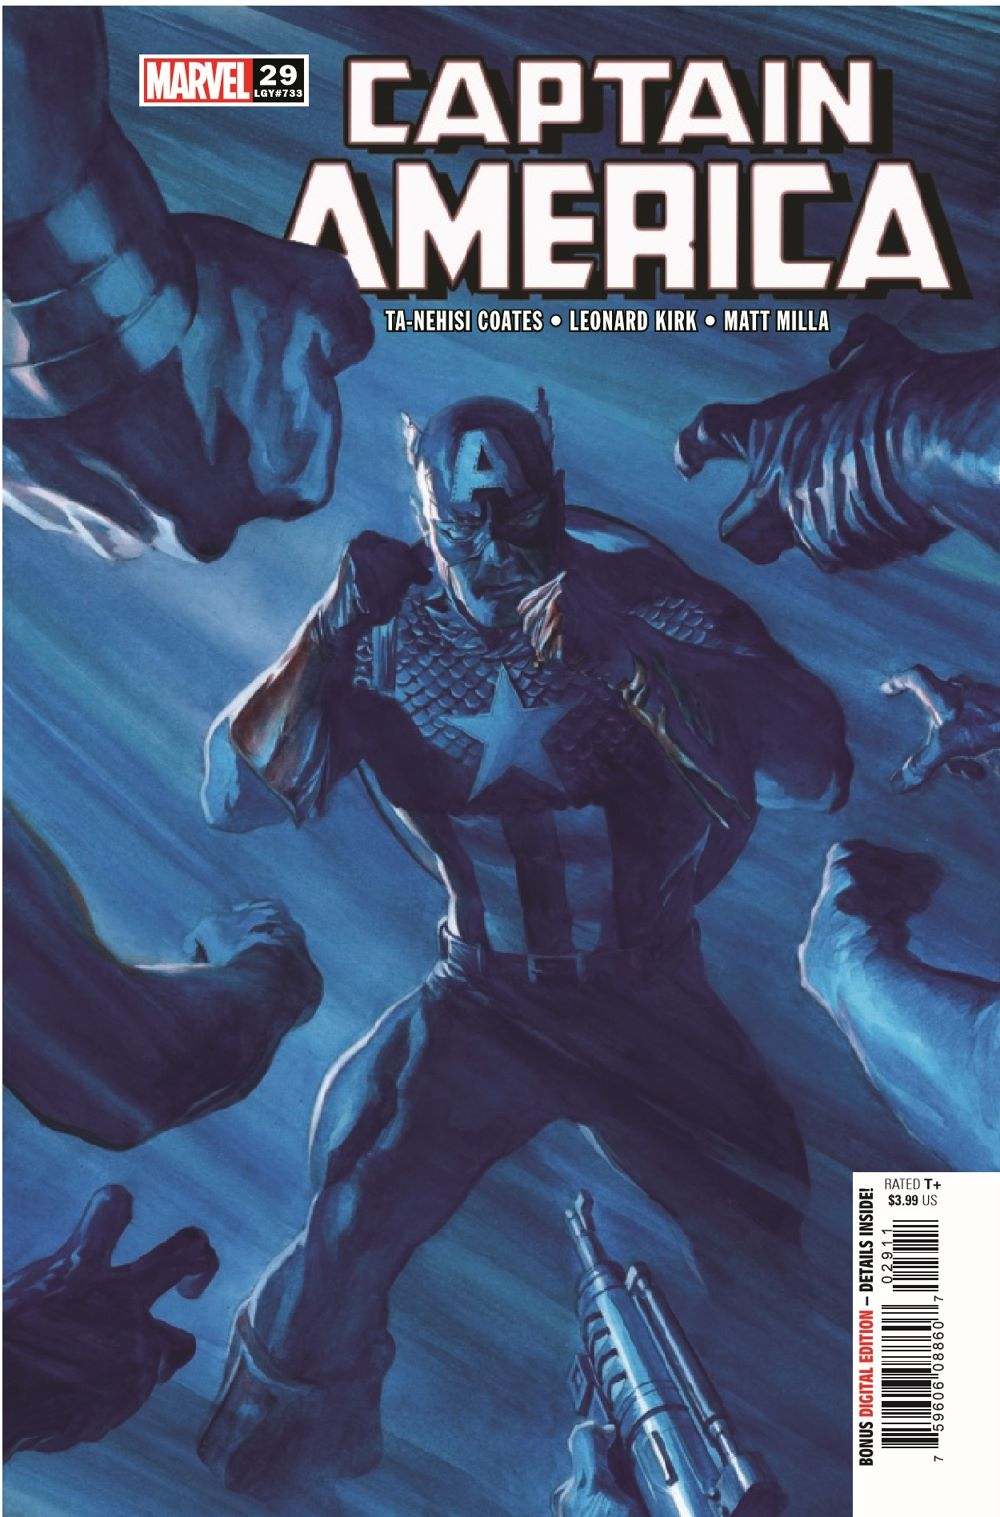 CAPA2018029_Preview-1 ComicList Previews: CAPTAIN AMERICA #29